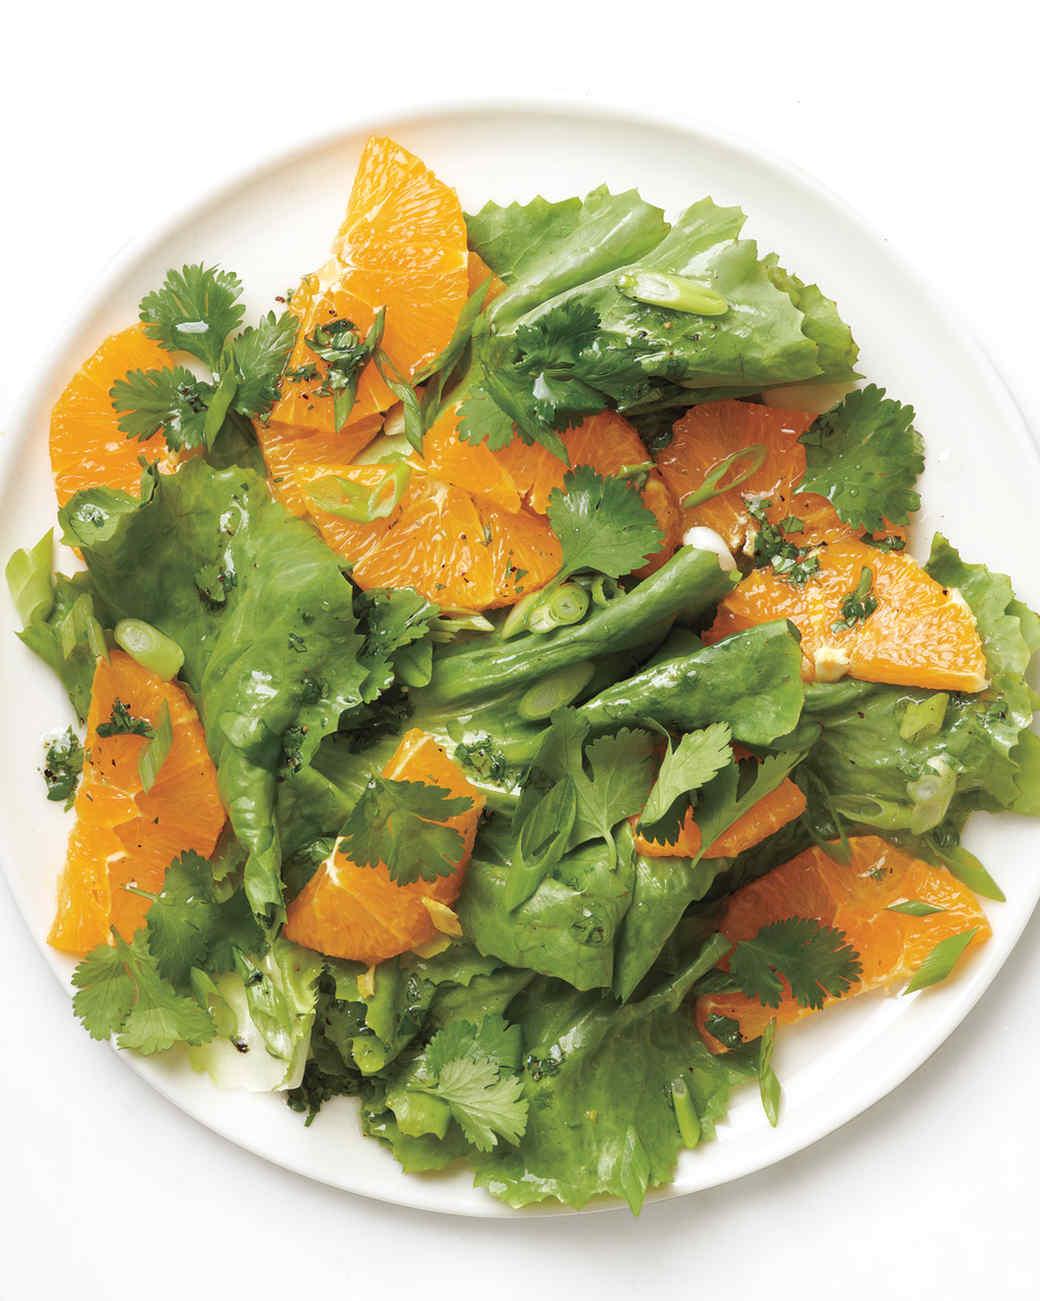 ots-escarole-orange-salad-001-med108875.jpg